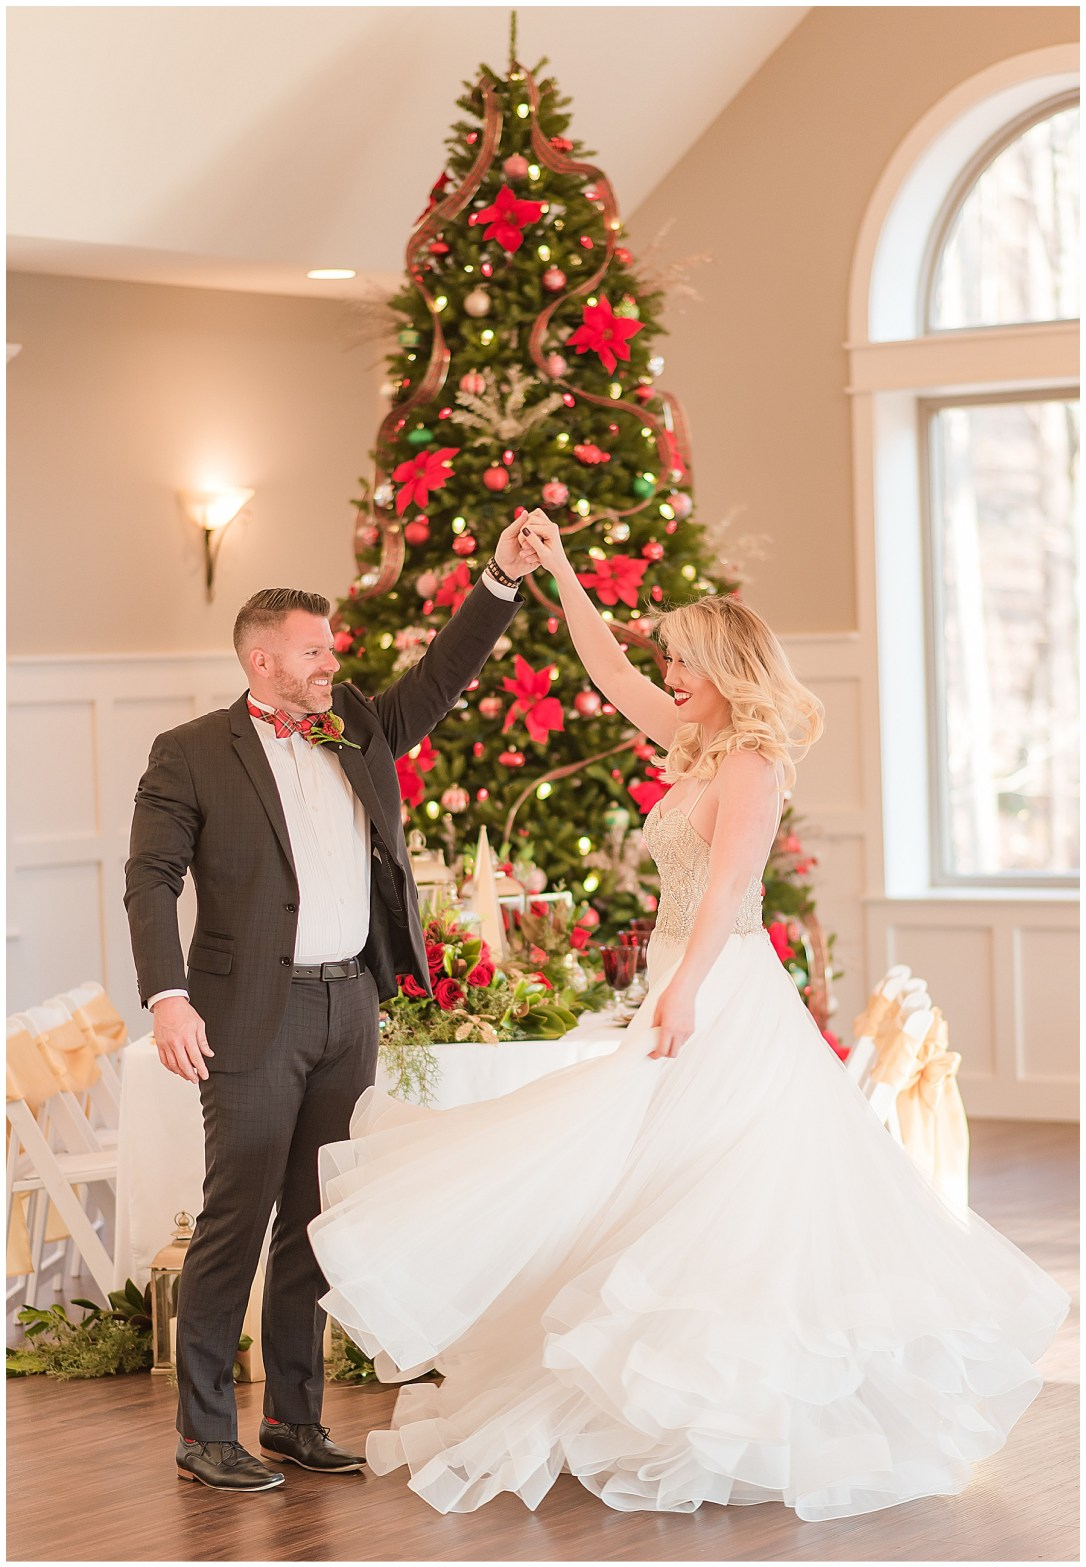 Christmas theme wedding reception ideas